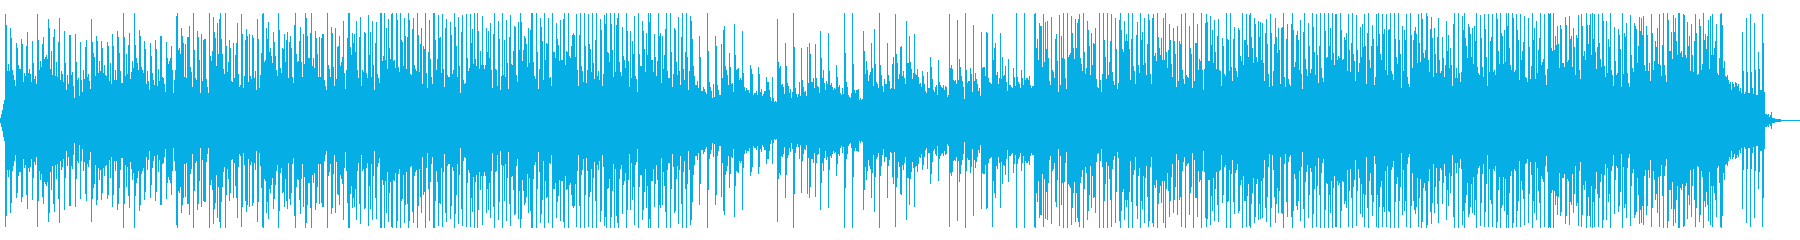 numeralsの再生済みの波形